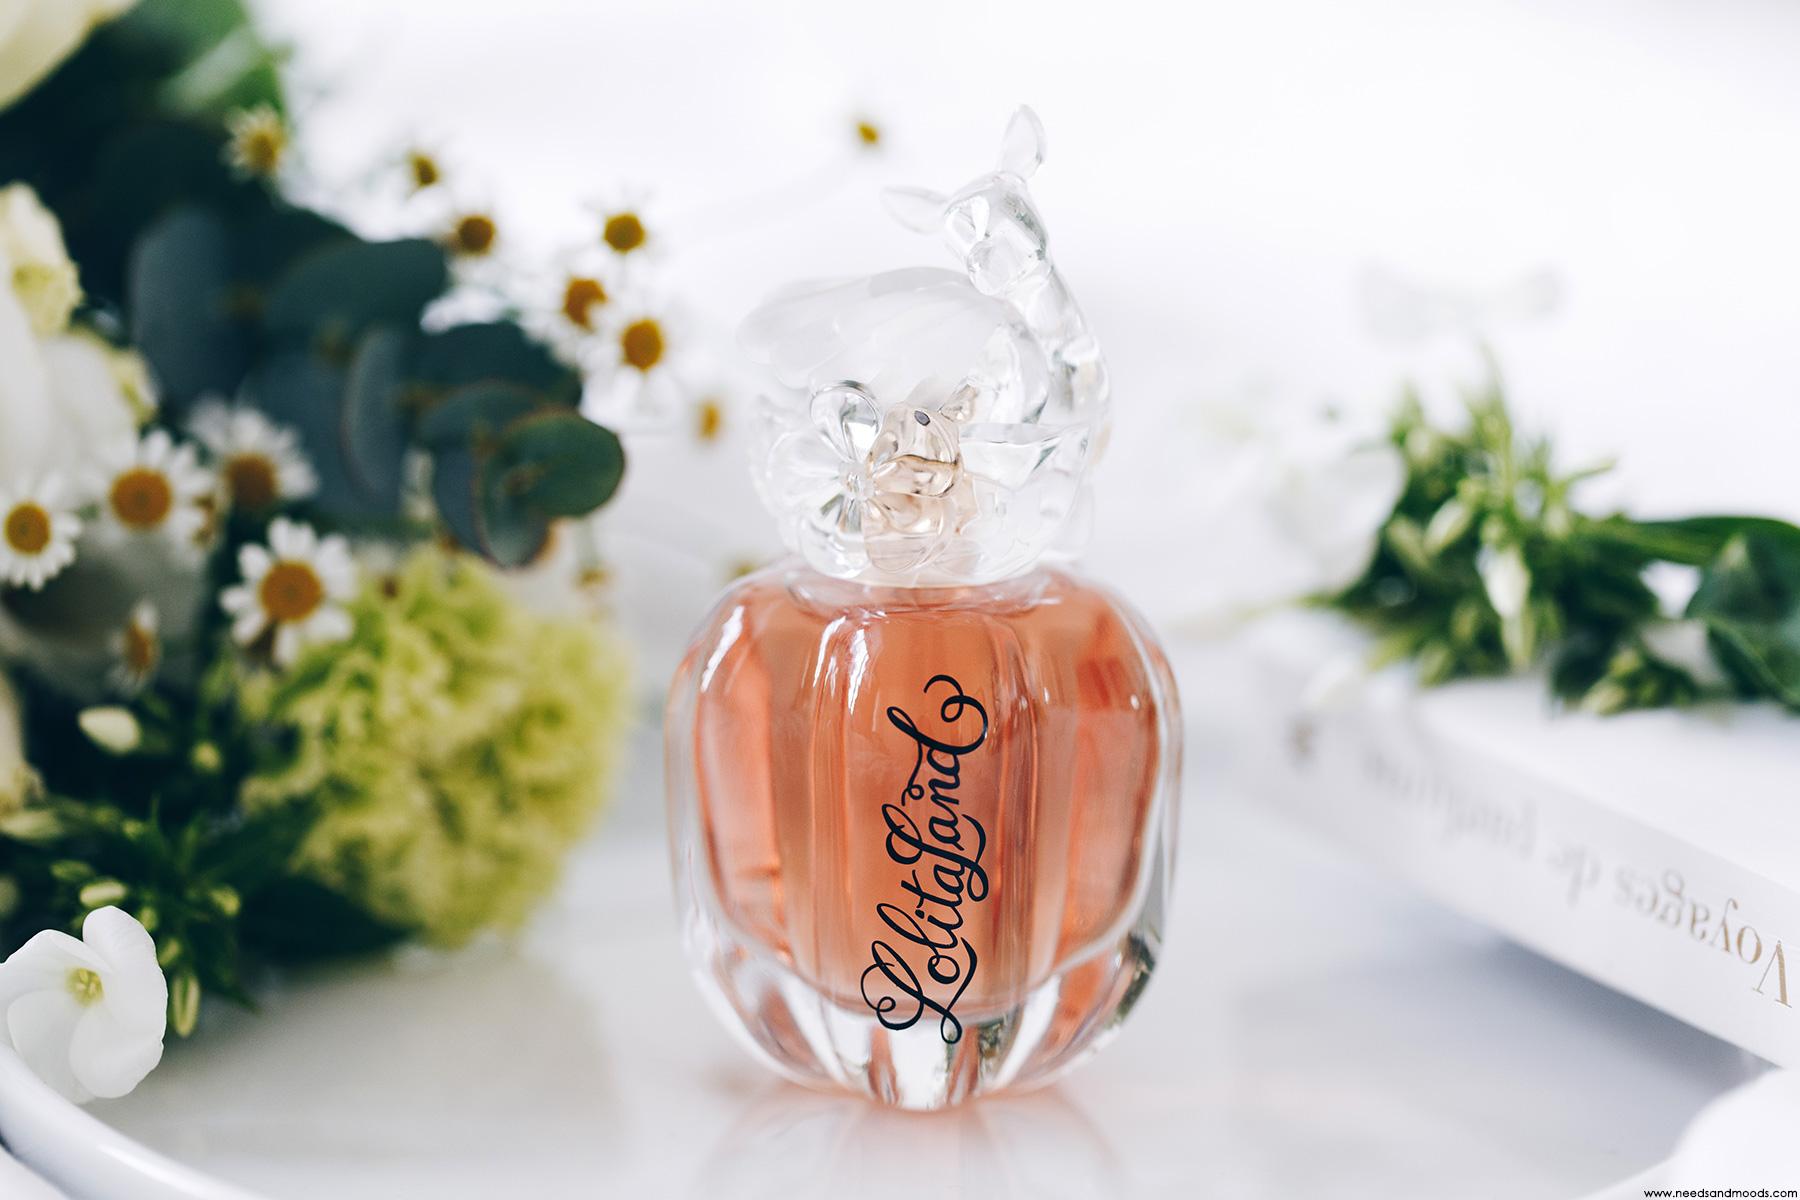 LolitalandMon Vegan Sur Lempicka Parfum Lolita Avis Ce 5Aj34RL